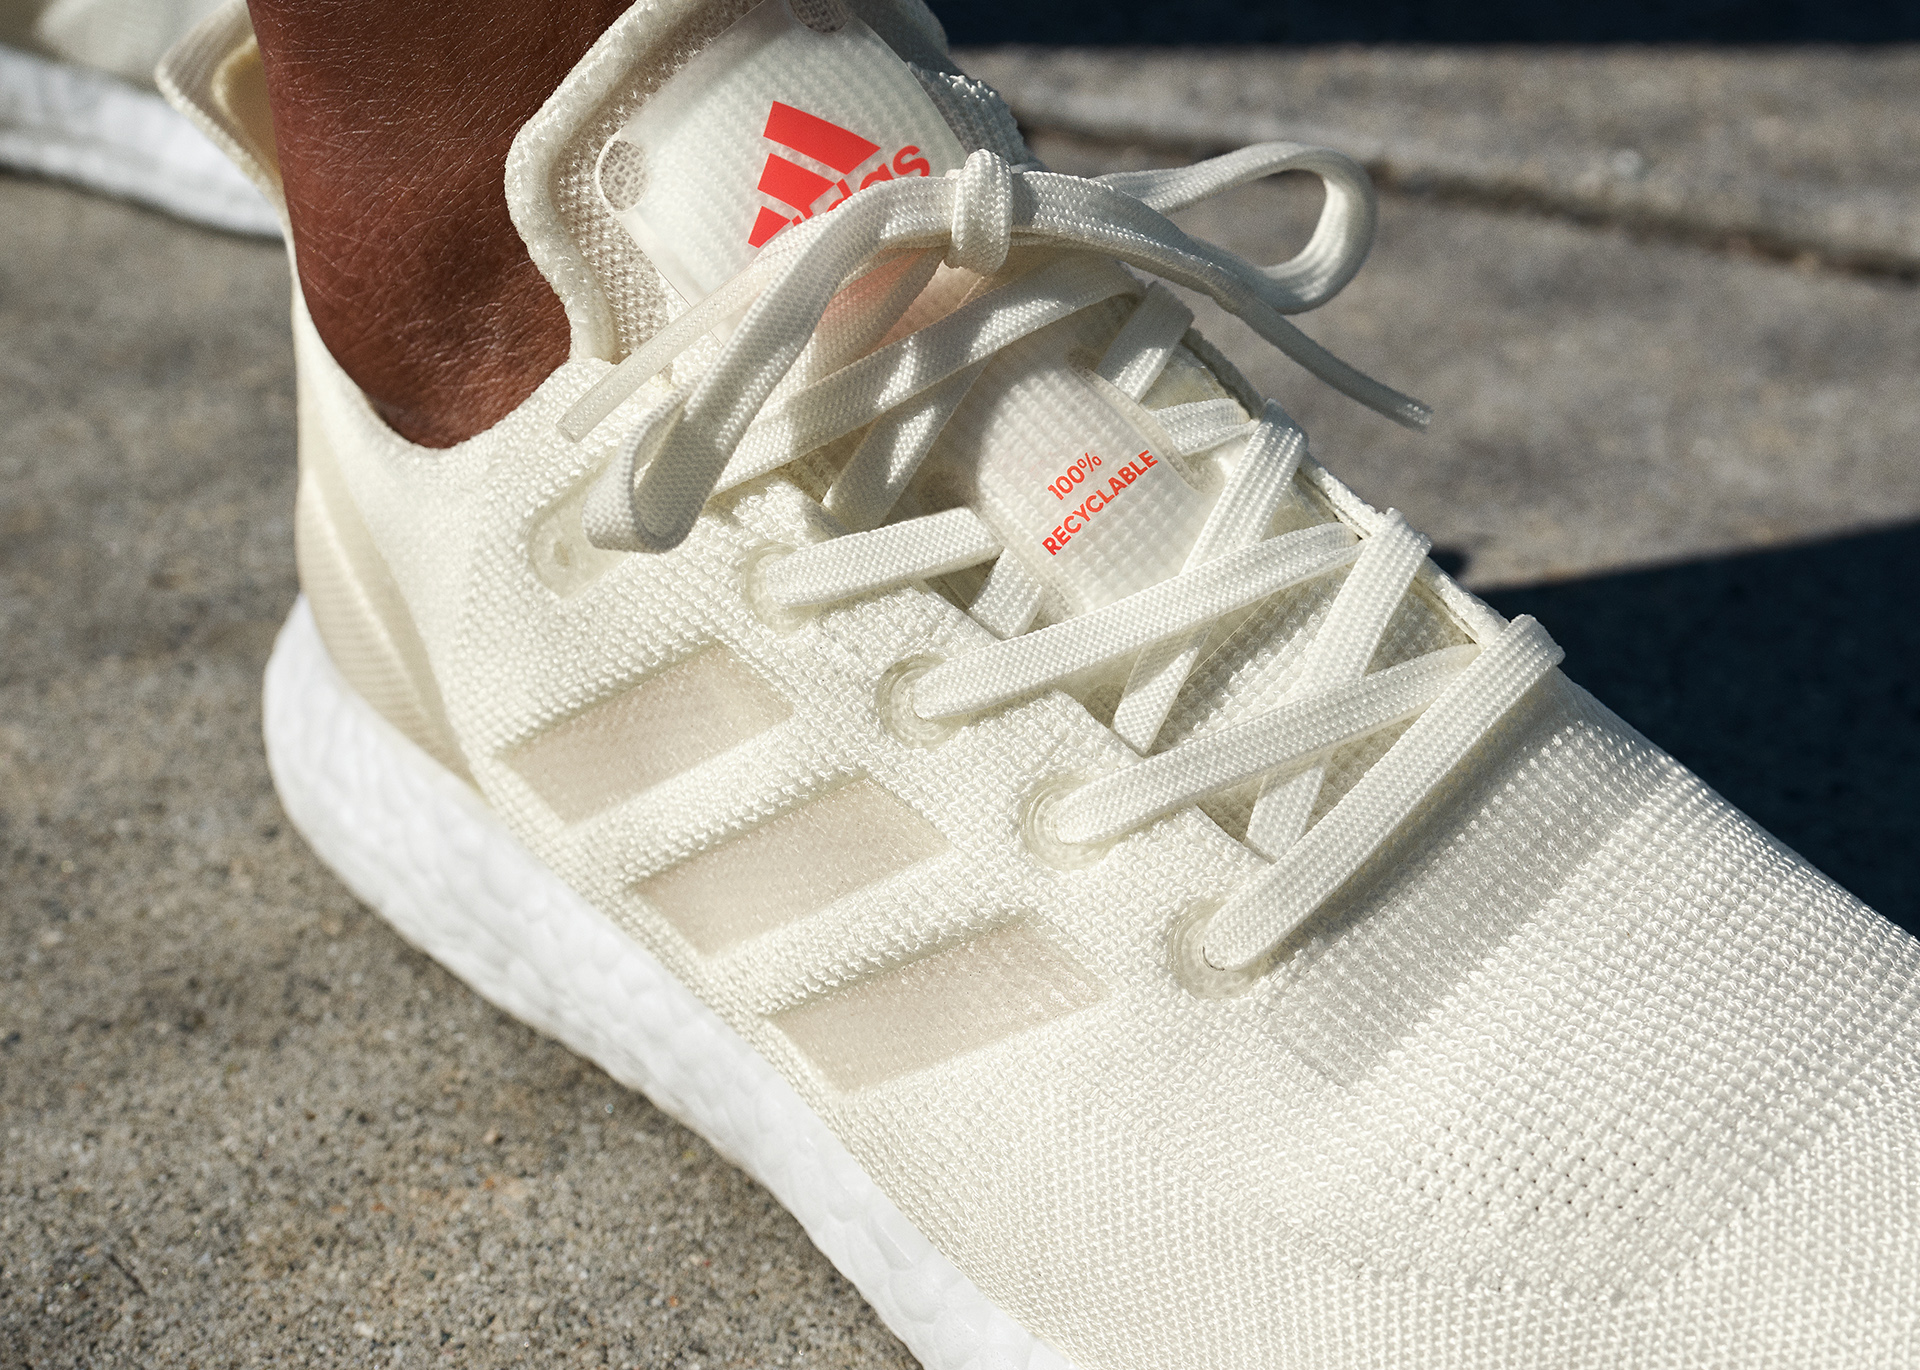 Adidas's Futurecraft.Loop is a zero waste, sustainable